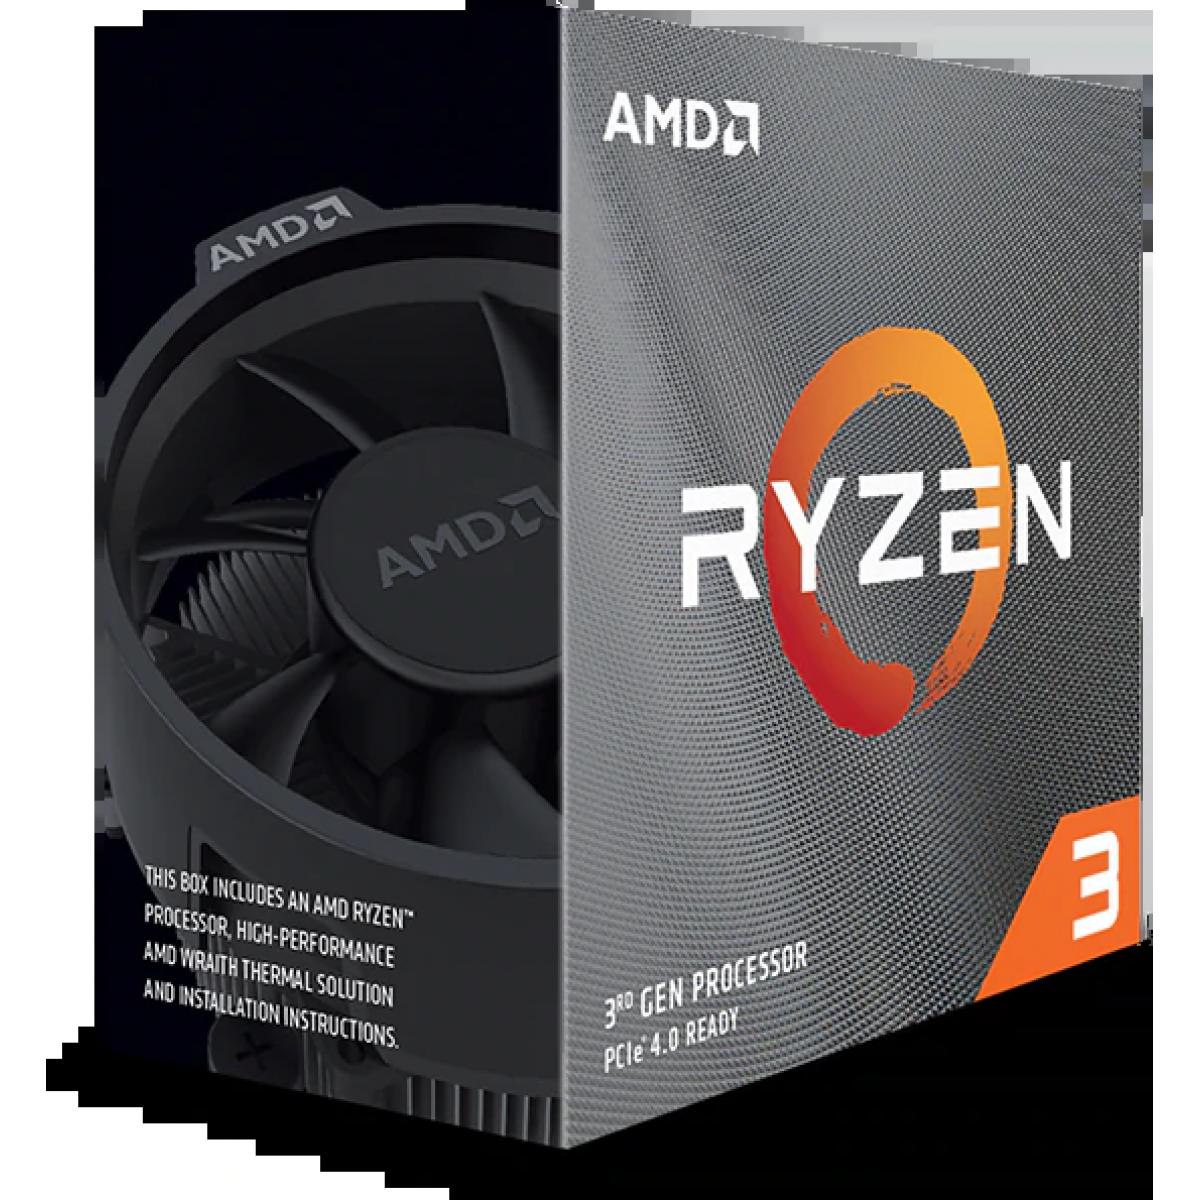 Processador AMD Ryzen 3 3300x 3.8GHz (4.3GHz Turbo), 4-Cores 8-Threads, Cooler Wraith Stealth, AM4, 100-100000159BOX